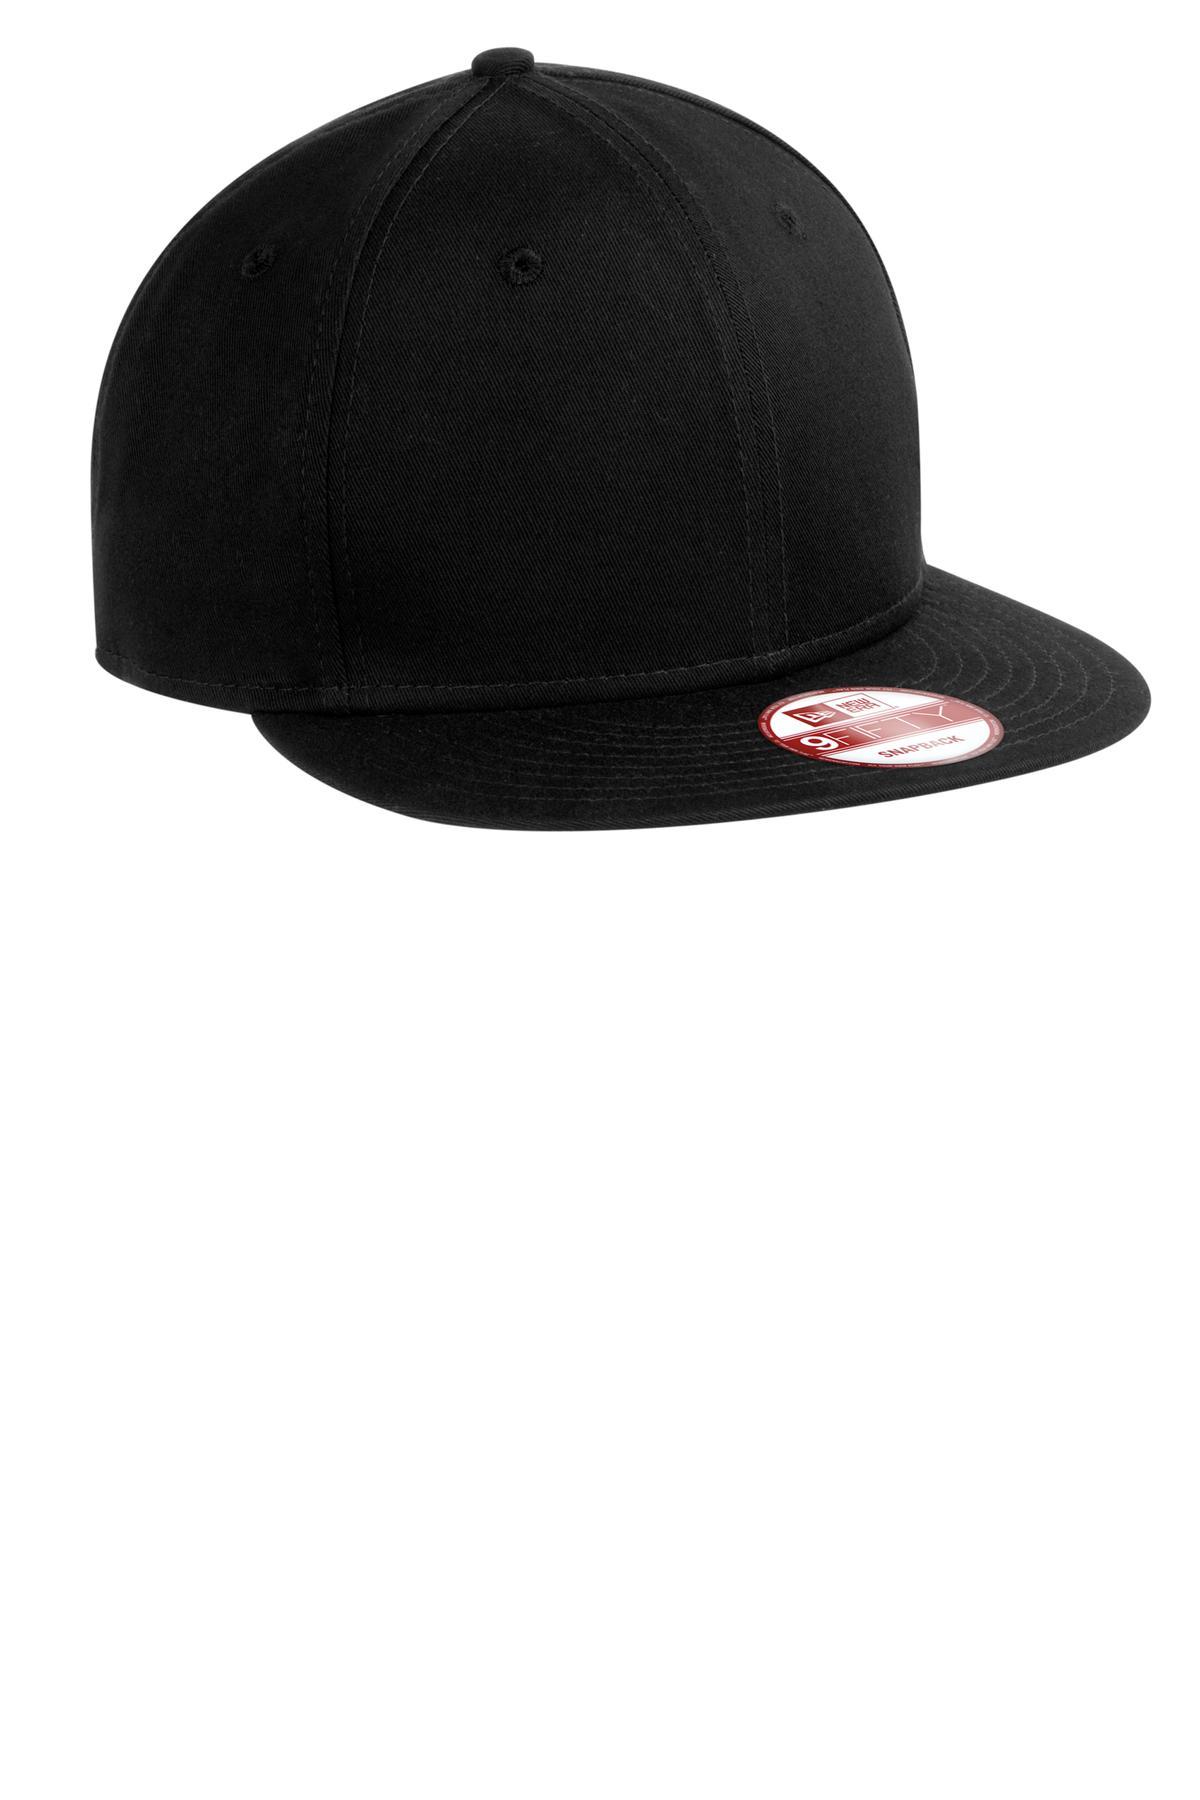 quality design 77423 ce9ce New Era ® – Flat Bill Snapback Cap. NE400